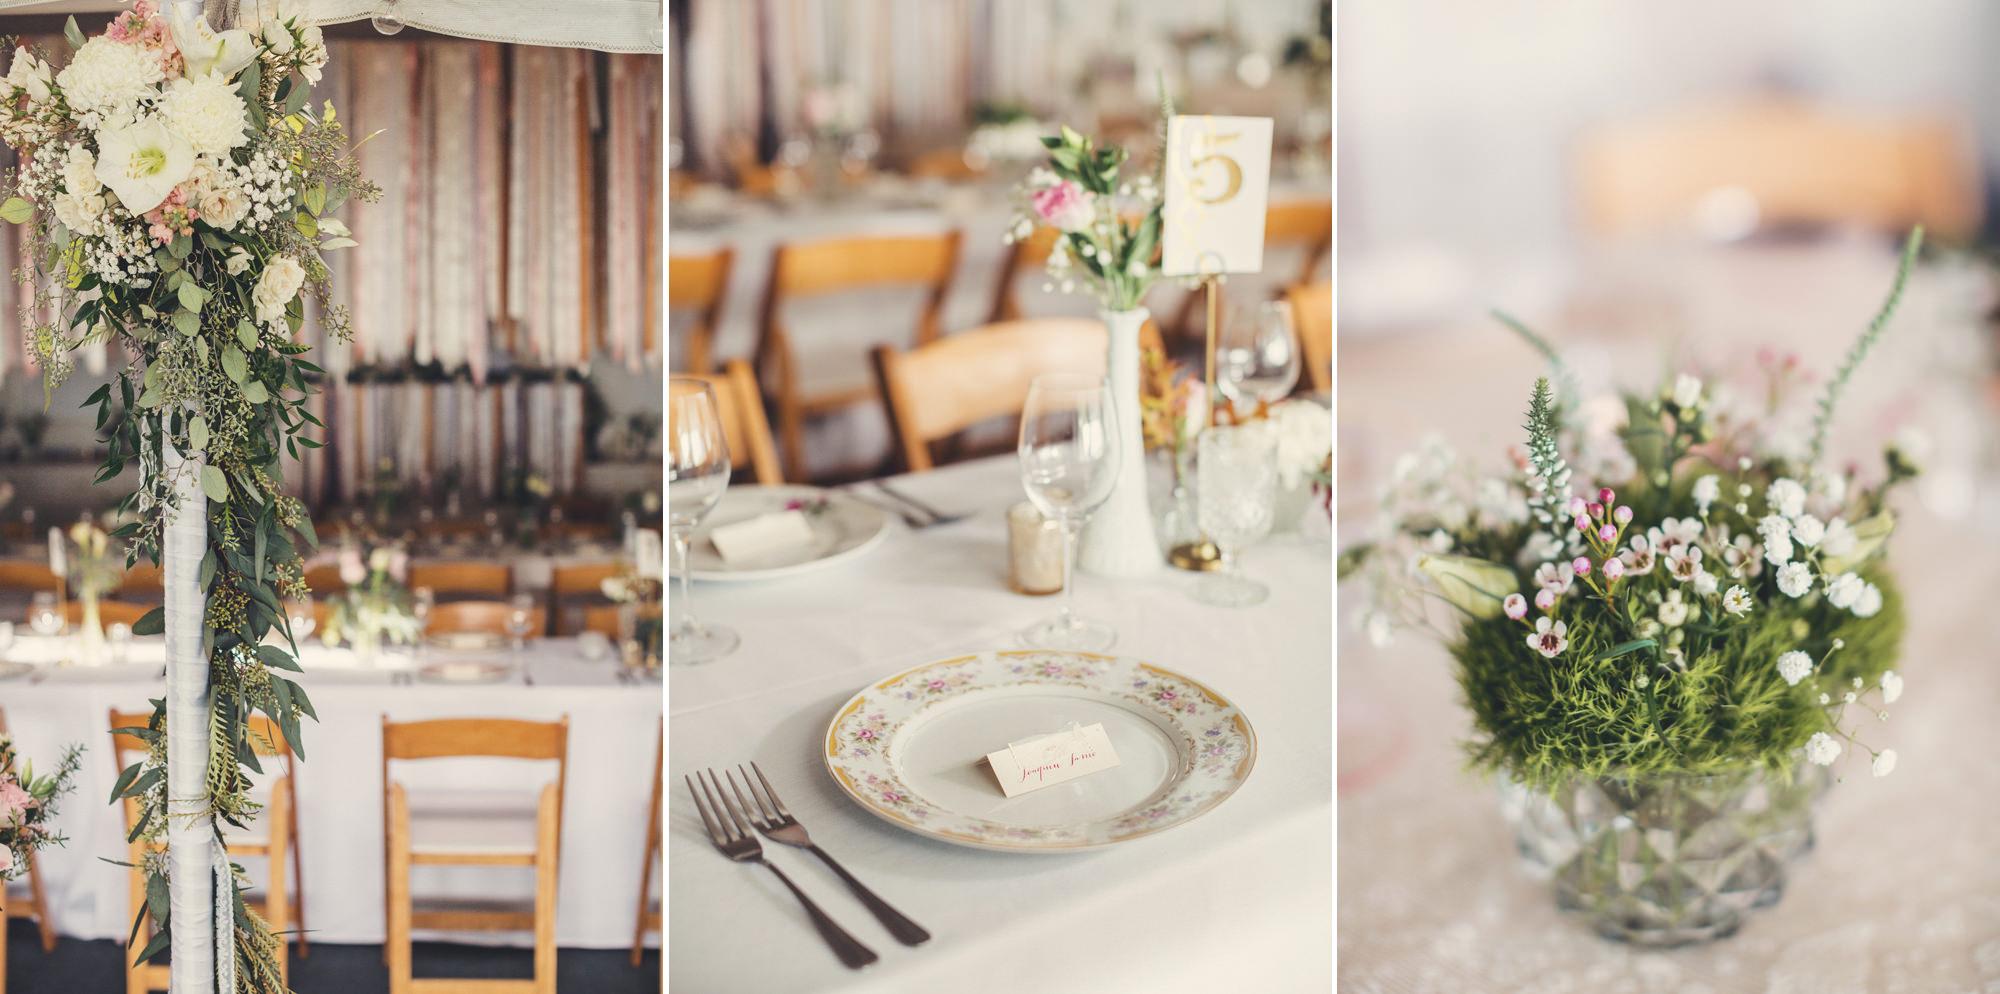 Little River Inn Wedding@Anne-Claire Brun 162